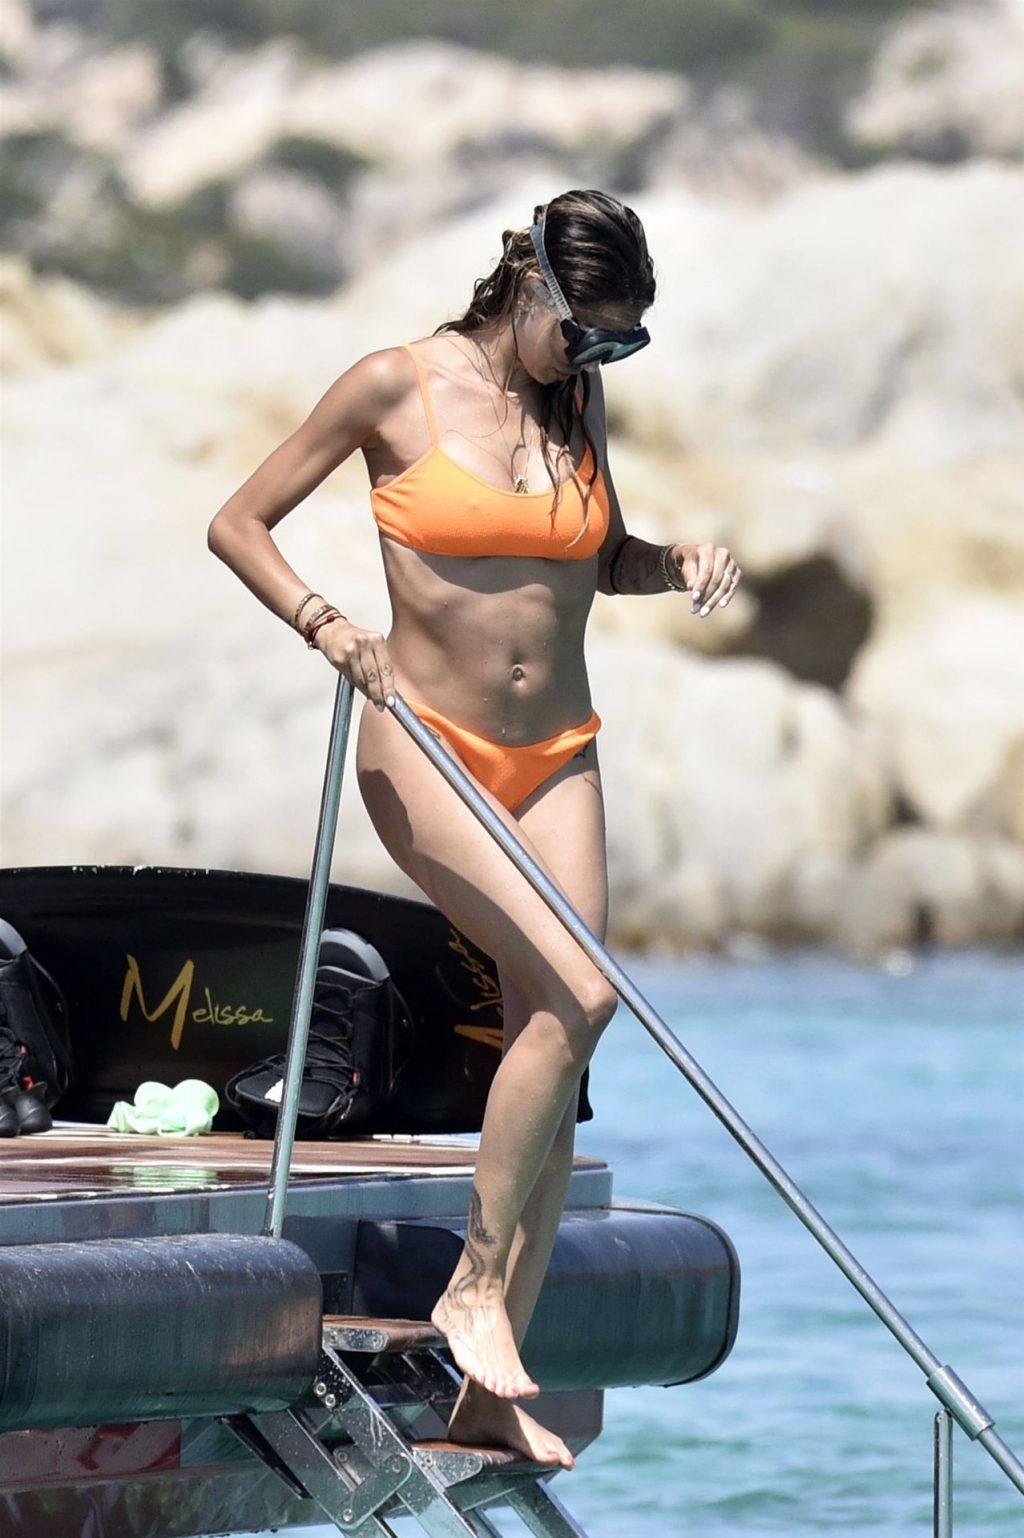 Kevin Prince Boateng & Melissa Satta Enjoy a Holiday in Sardinia (36 Photos)